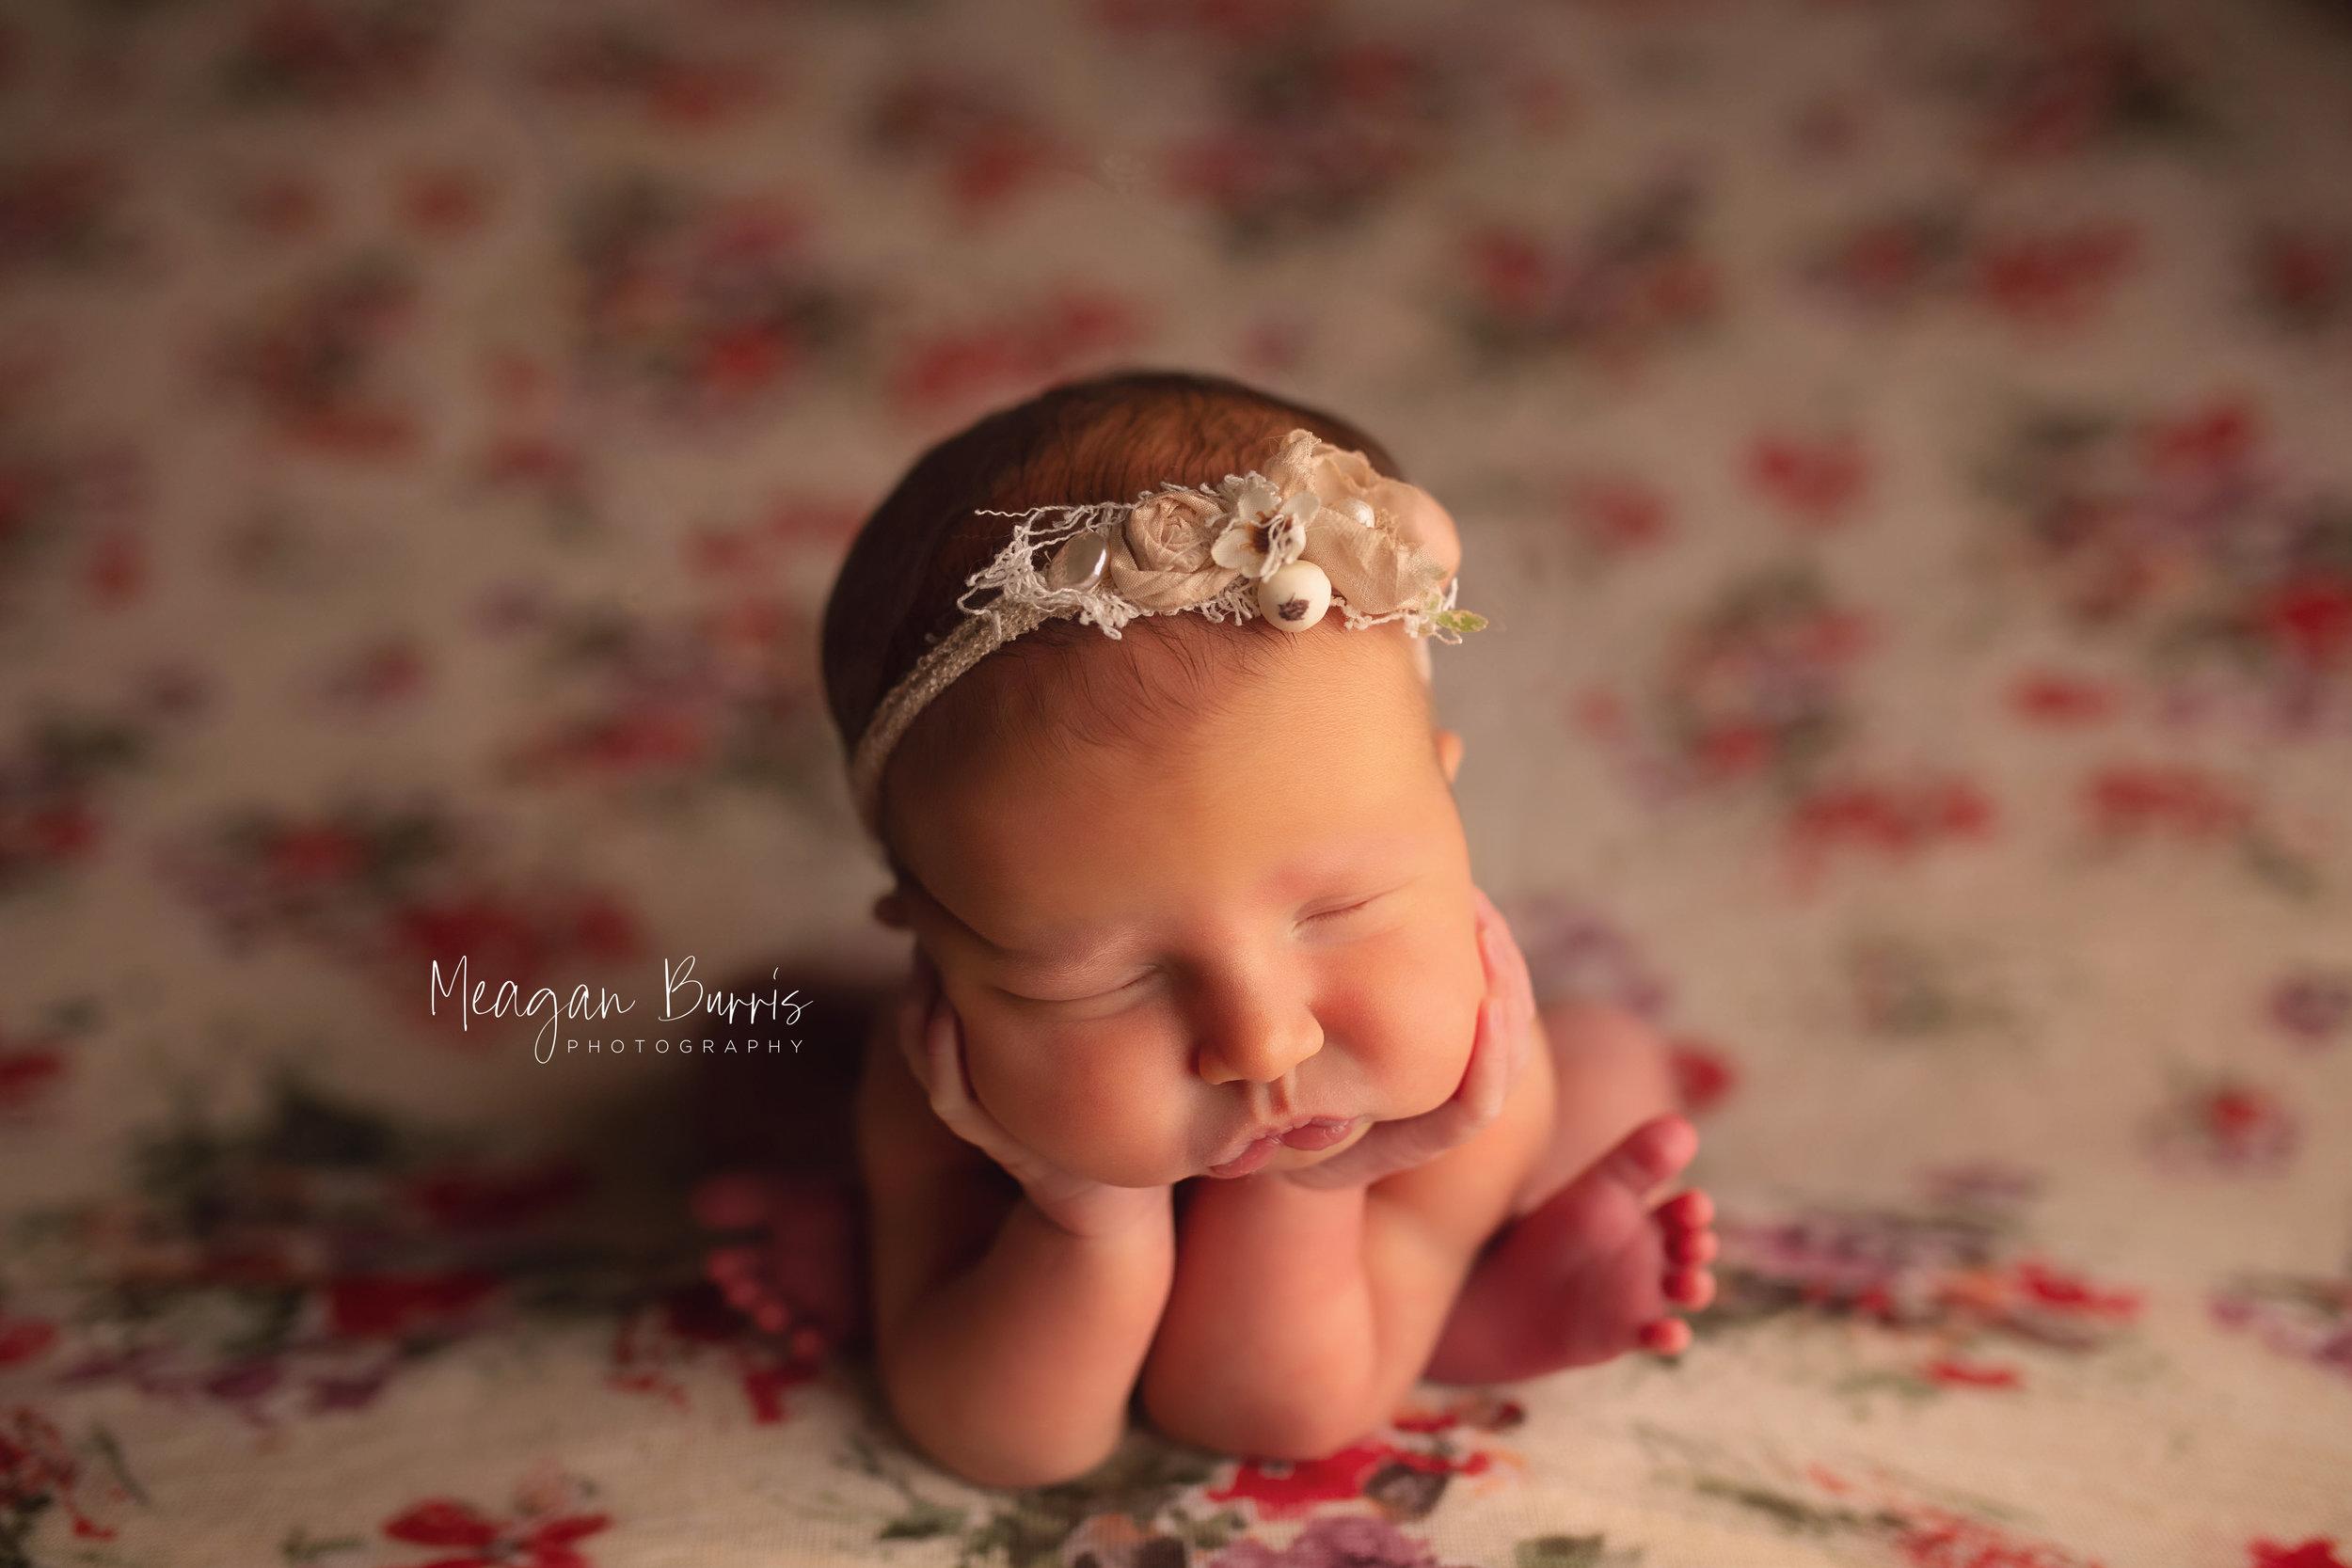 braelyn_ greenwood newborn photographer8.jpg